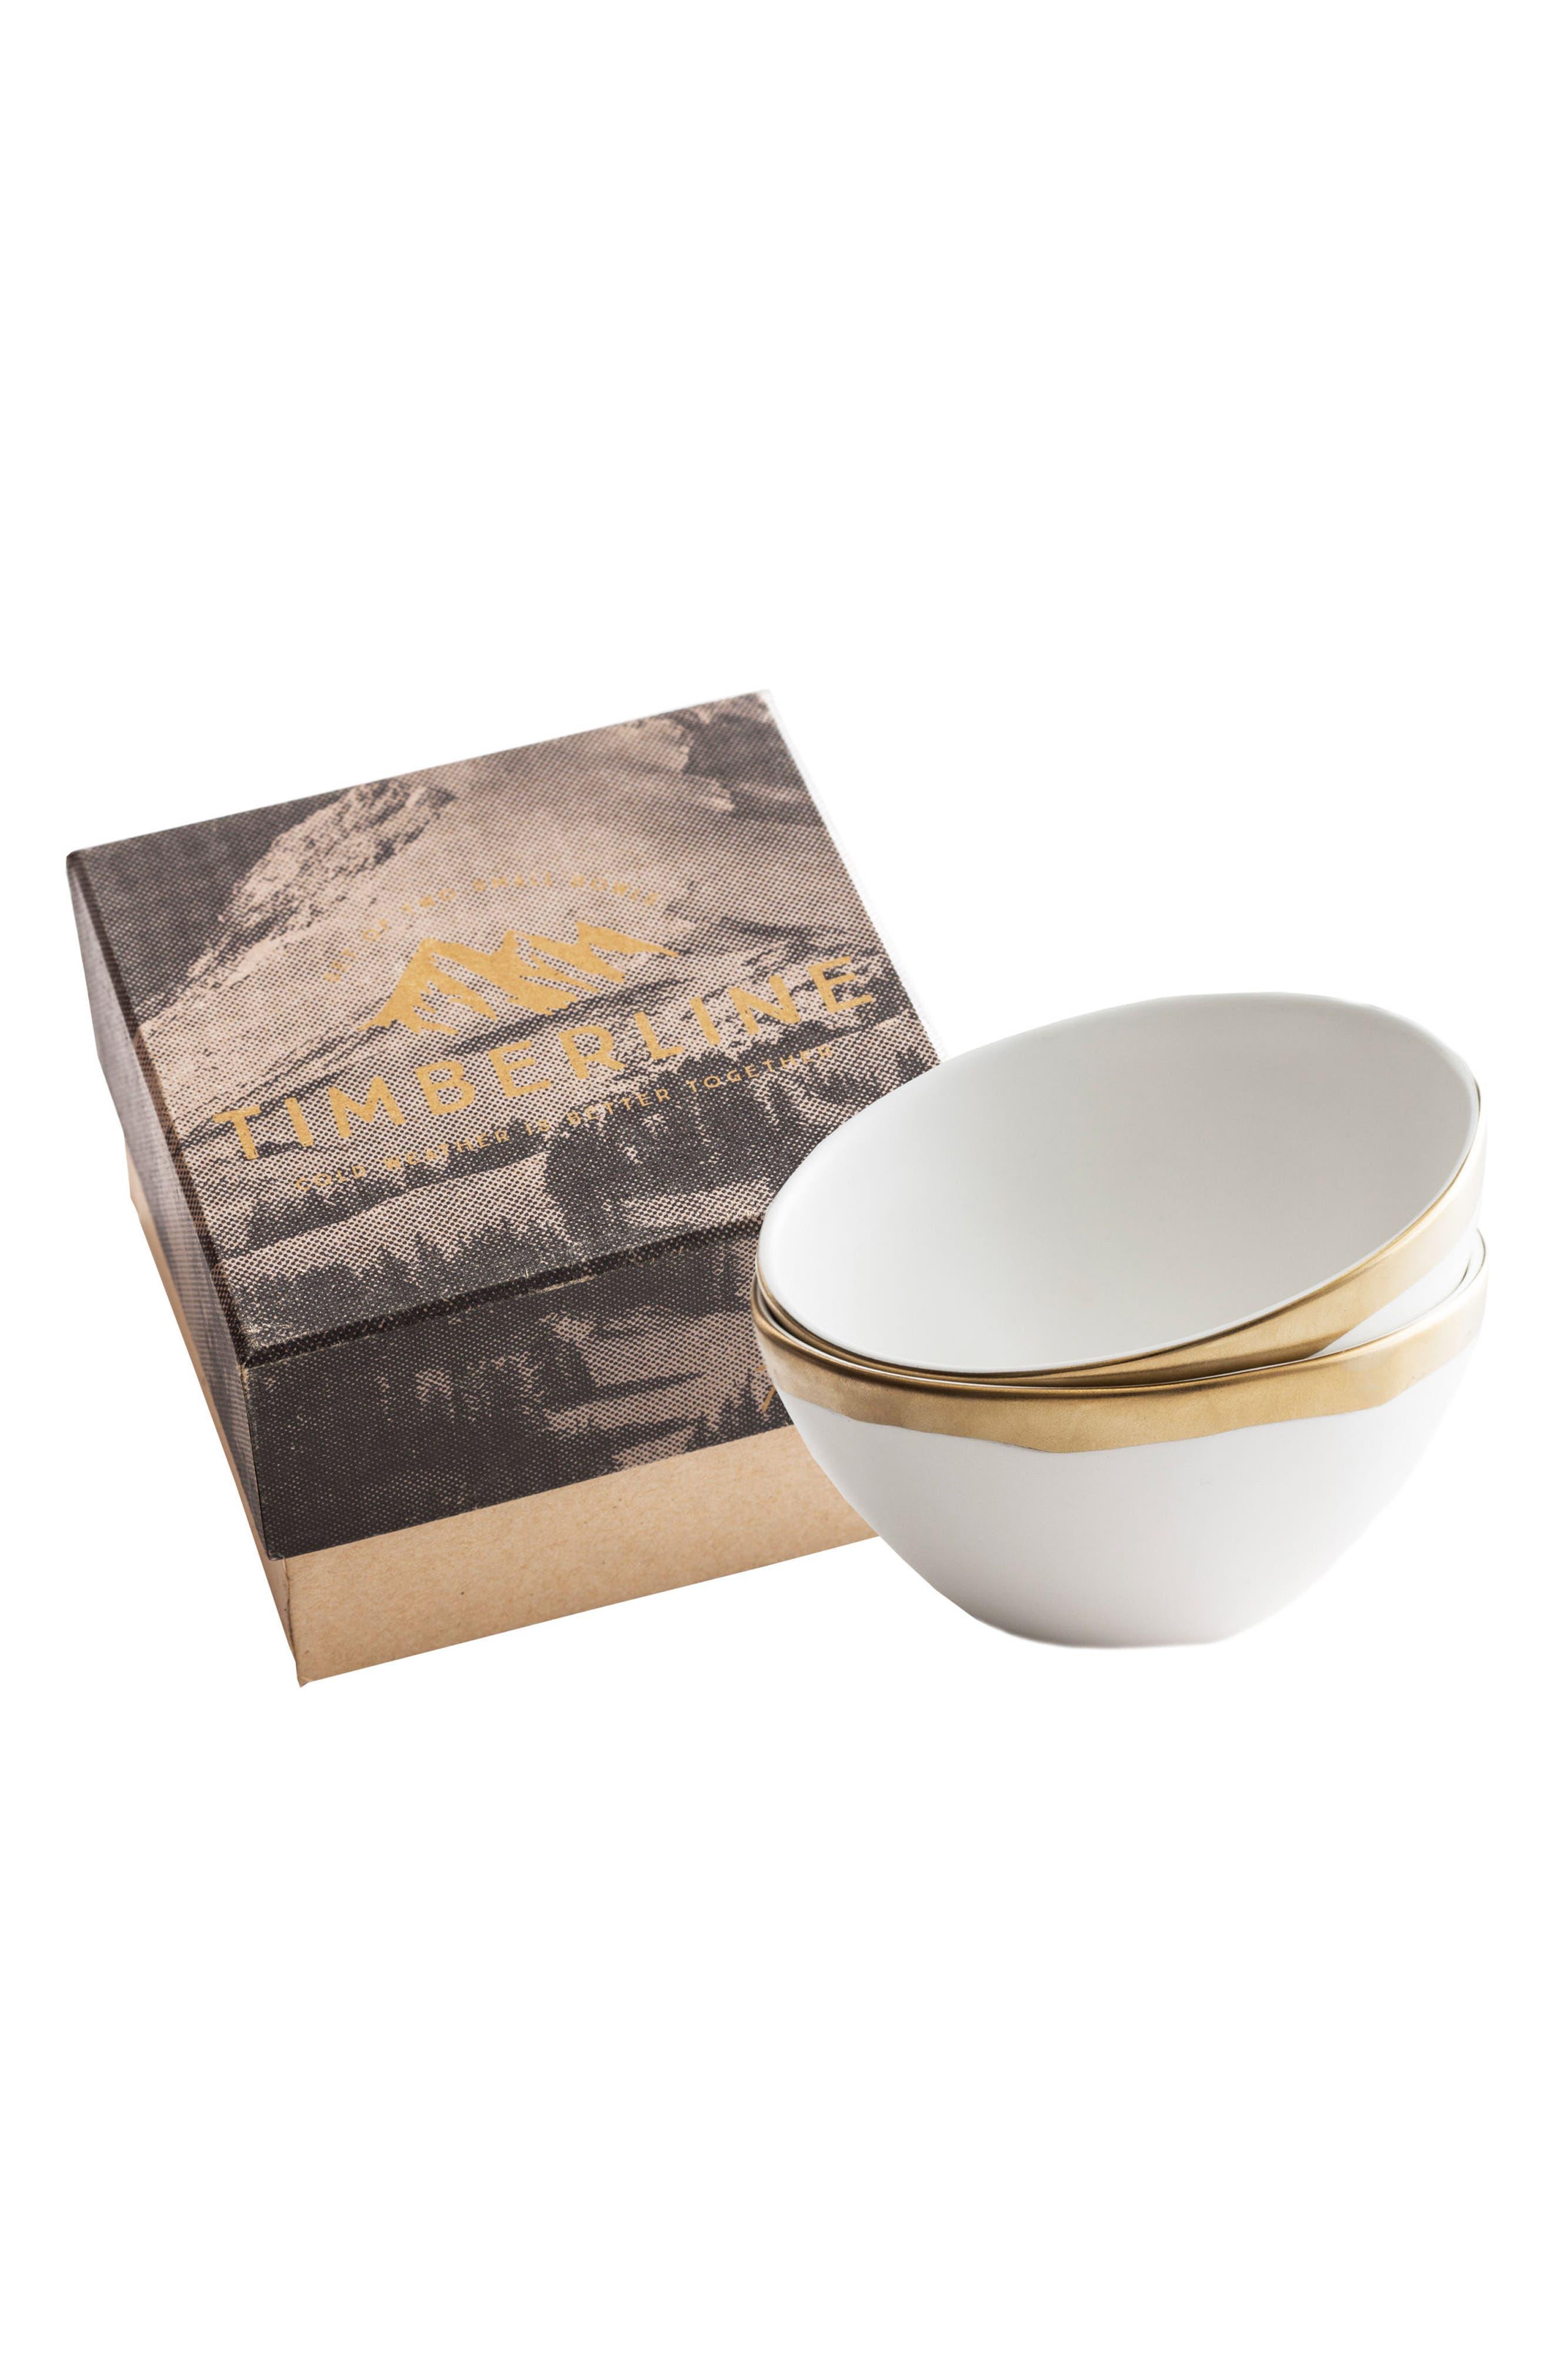 Timberline Set of 2 Porcelain Bowls,                             Main thumbnail 1, color,                             100